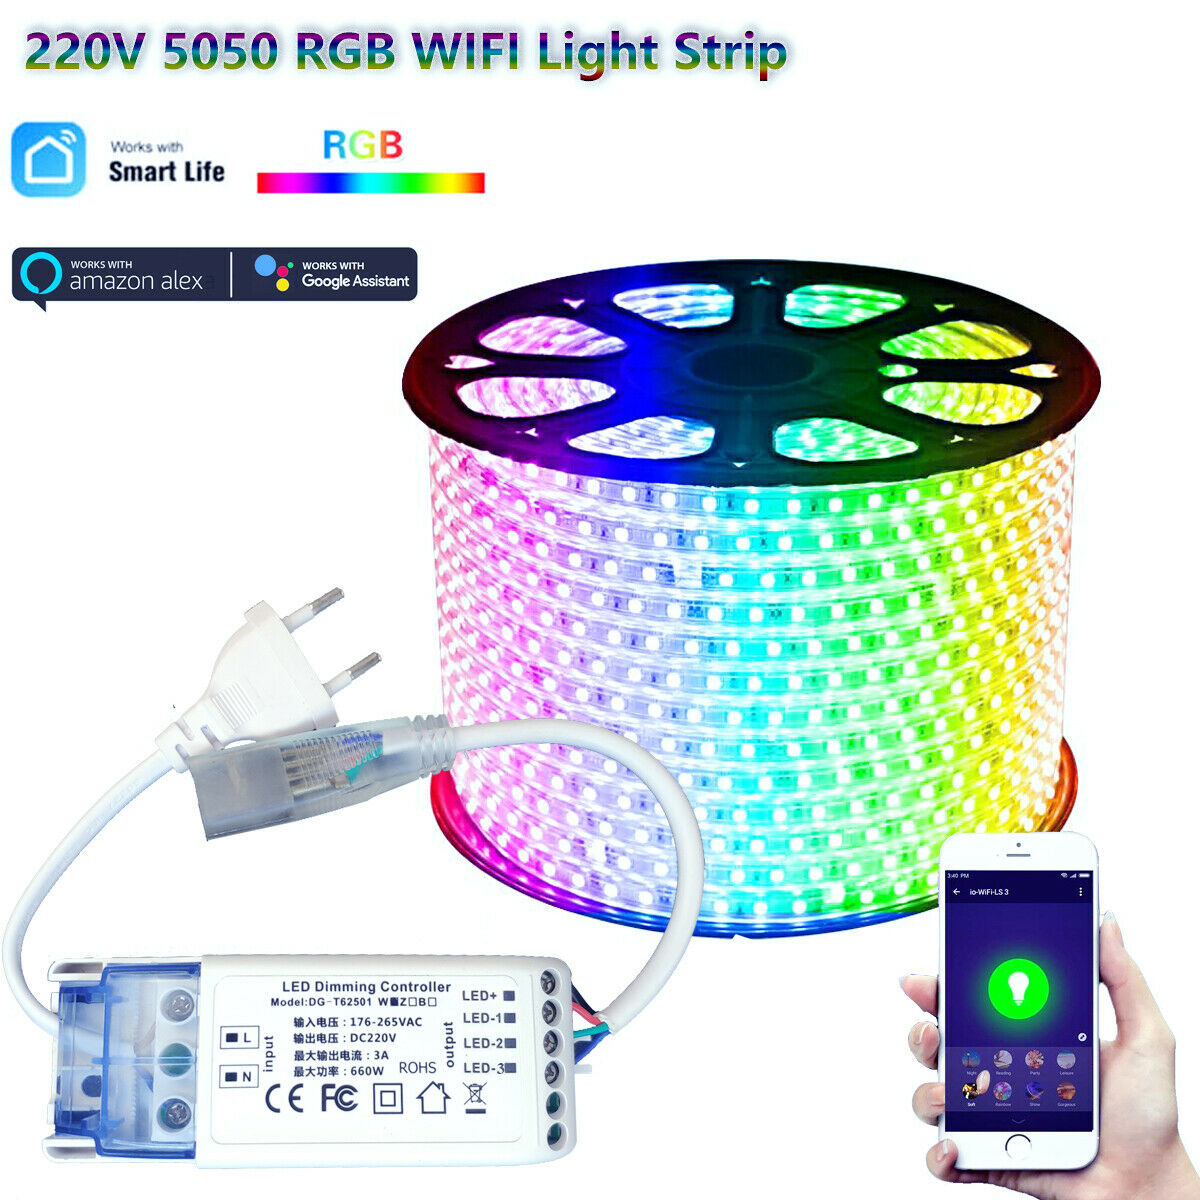 220V WIFI Smart life TUYA APP Controller 1m-30m RGB LED 5050SMD LED Strip  RF Remote control LED Dimmer for Aleax Google